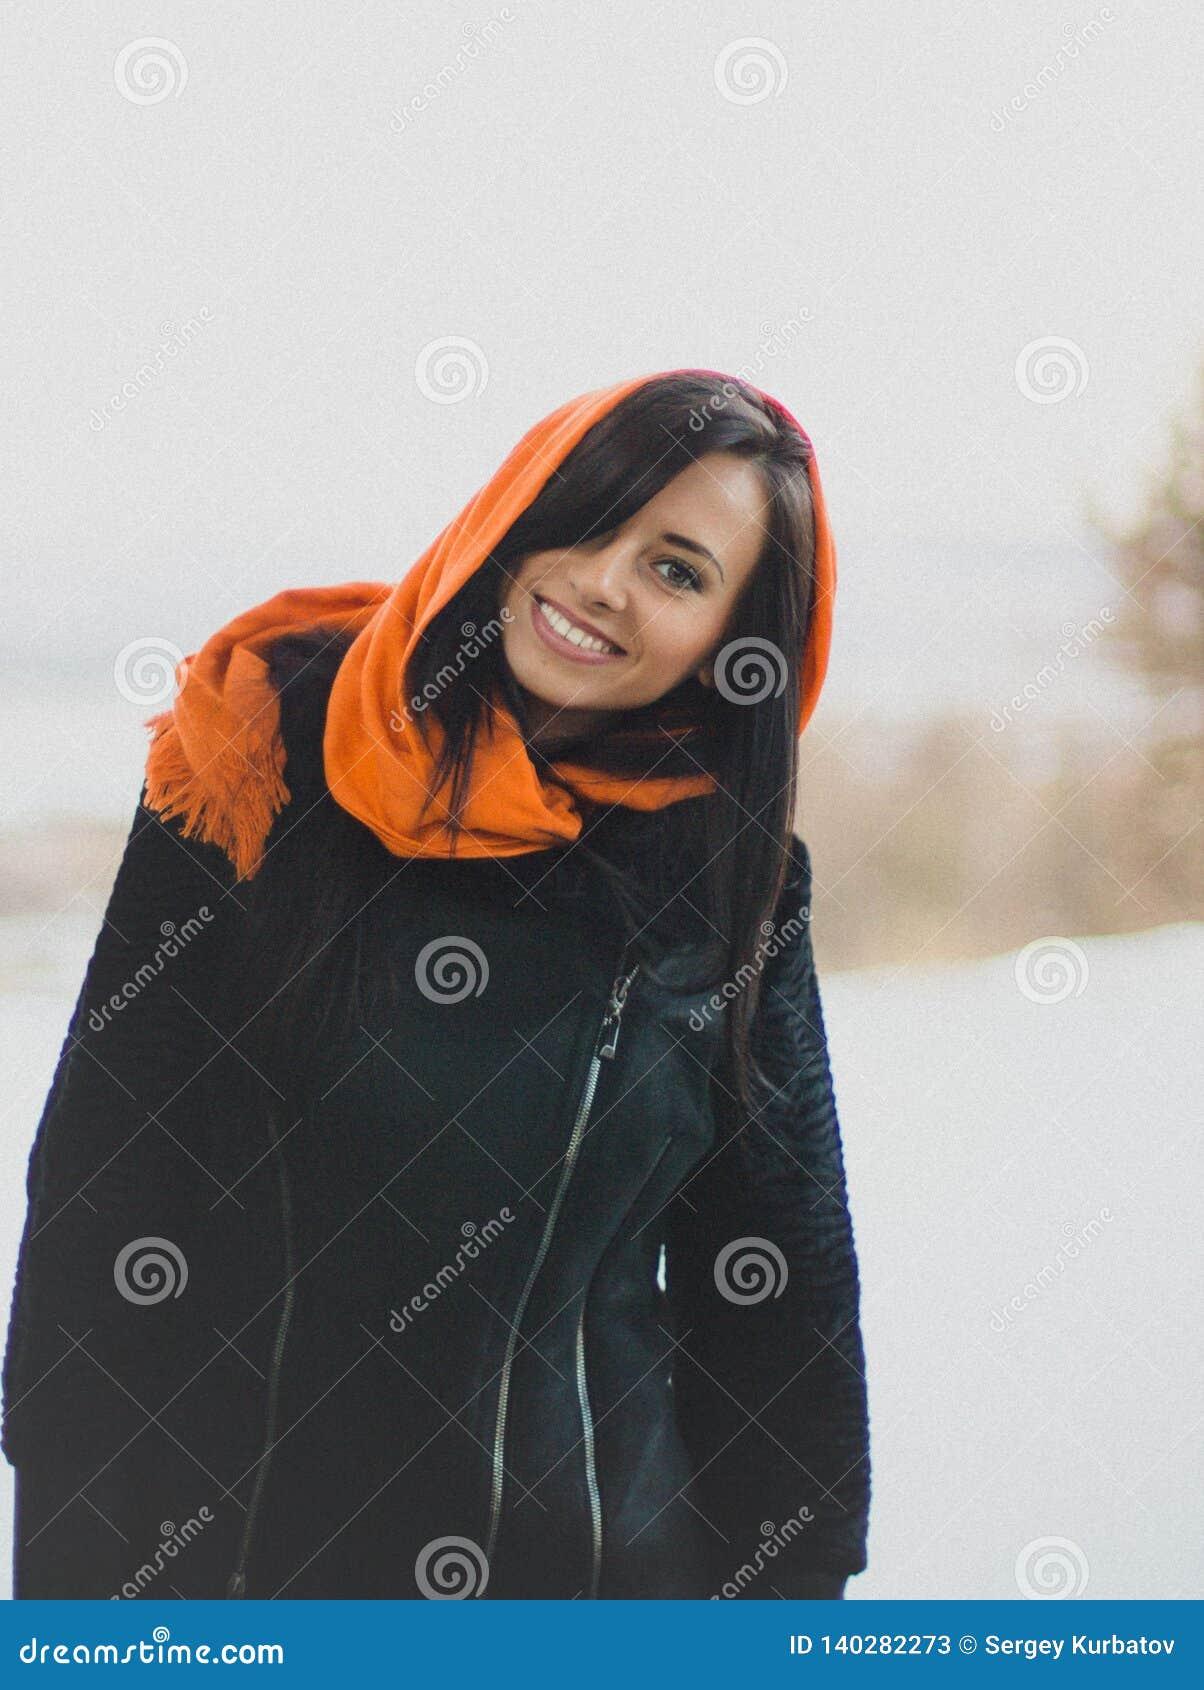 Smiling girl in orange hijab